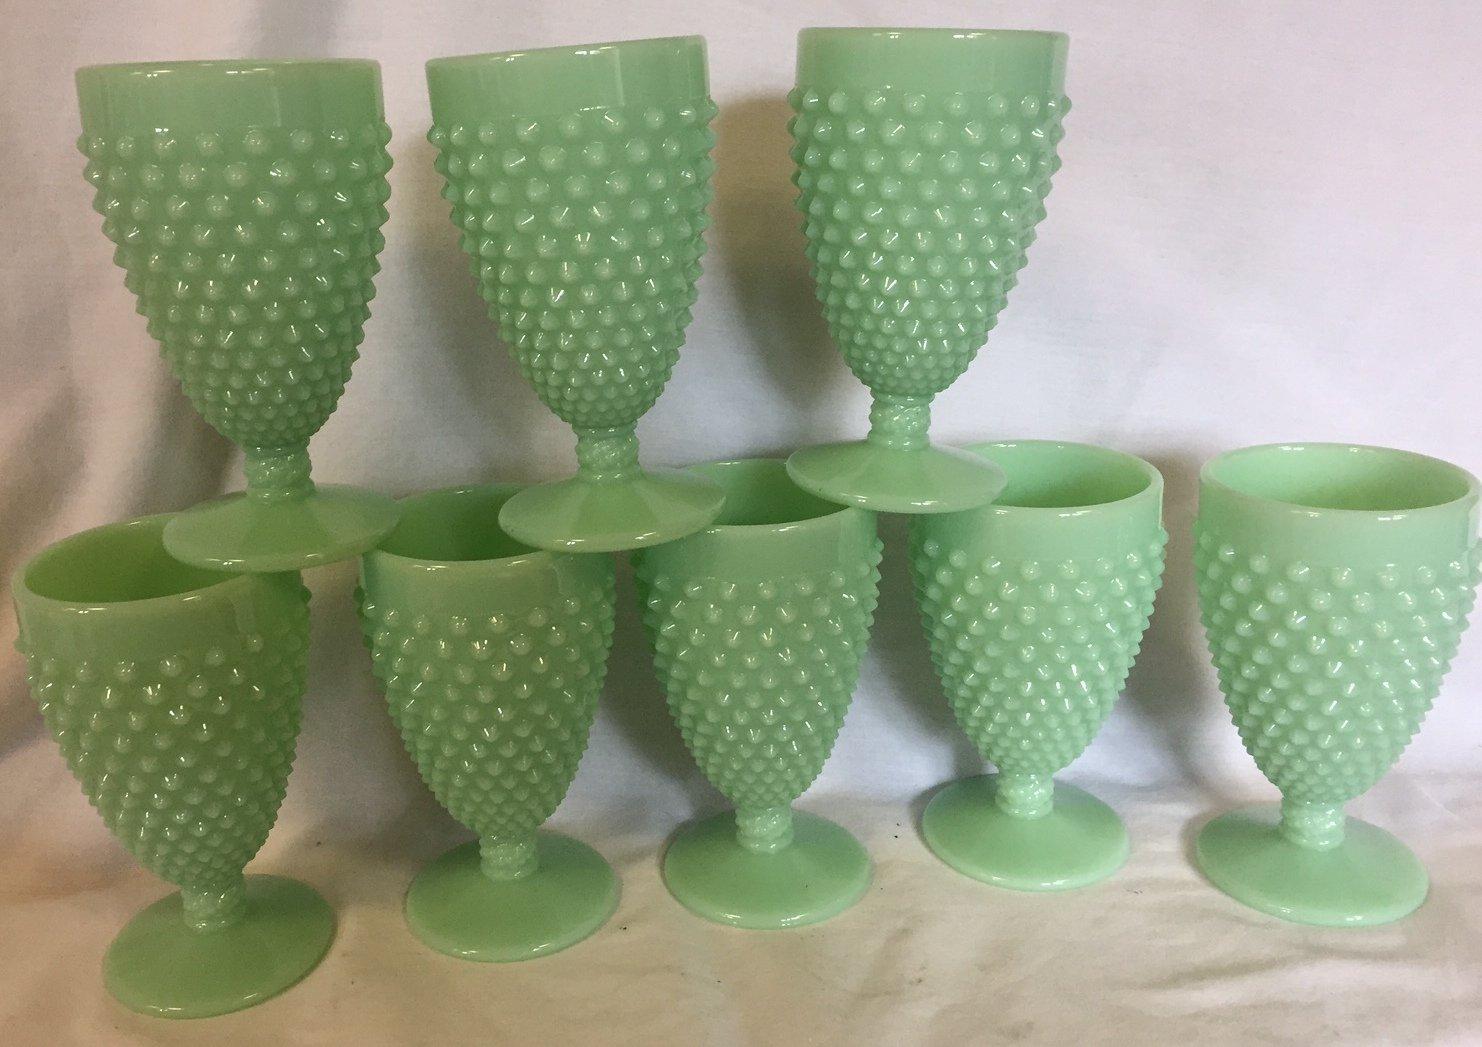 Hobnail Pattern - Tumbler or Juice Glass - Jadeite - American Made - Mosser USA (8)